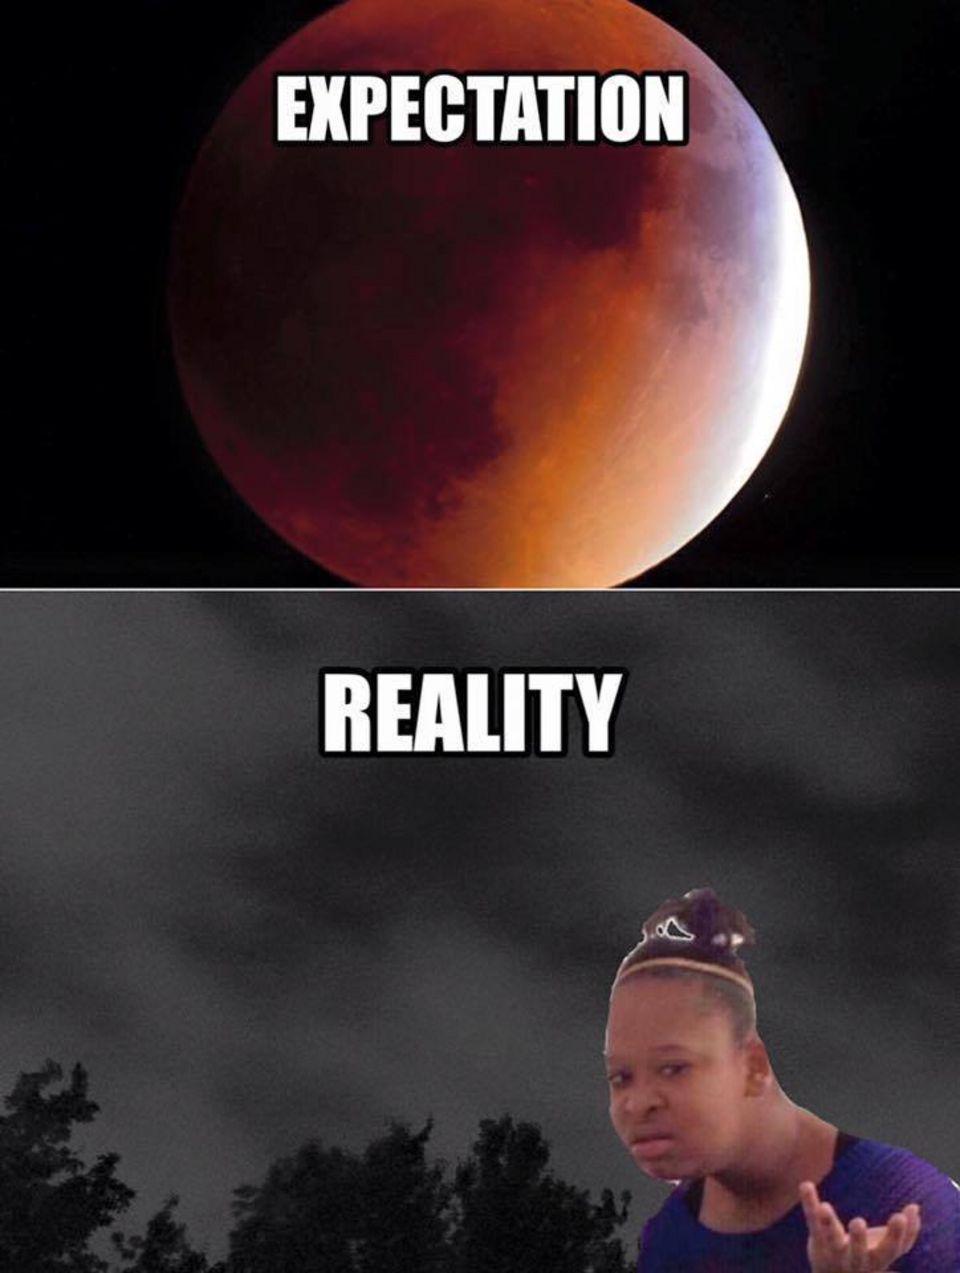 blood-moon-photo-meme